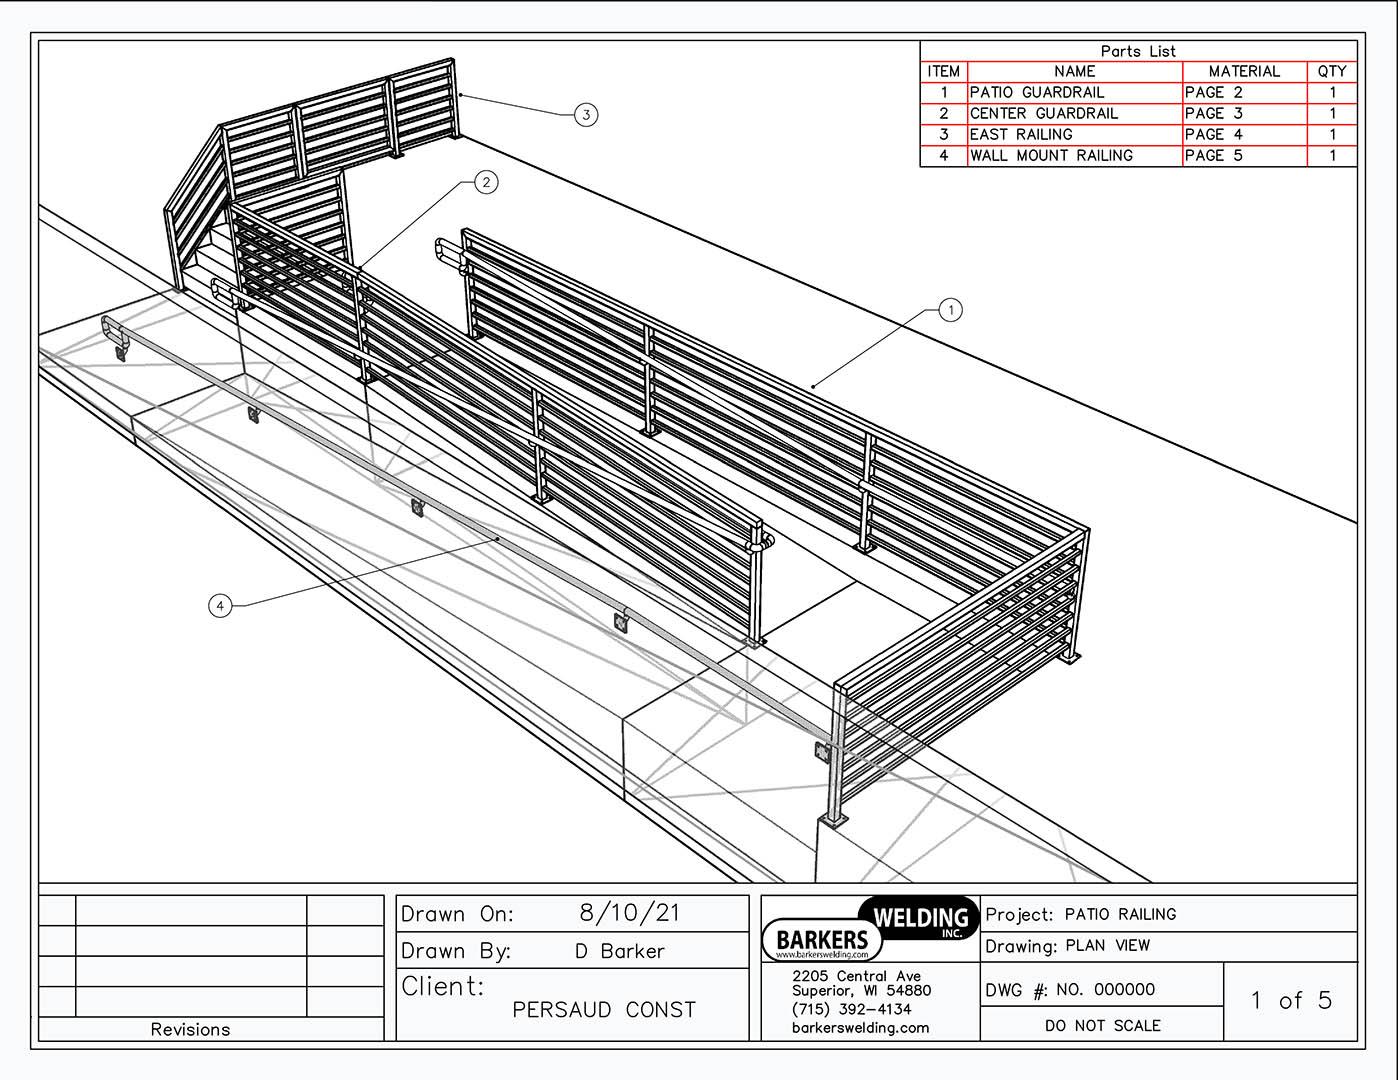 cad services - 3d plan view of handicap ramp railing